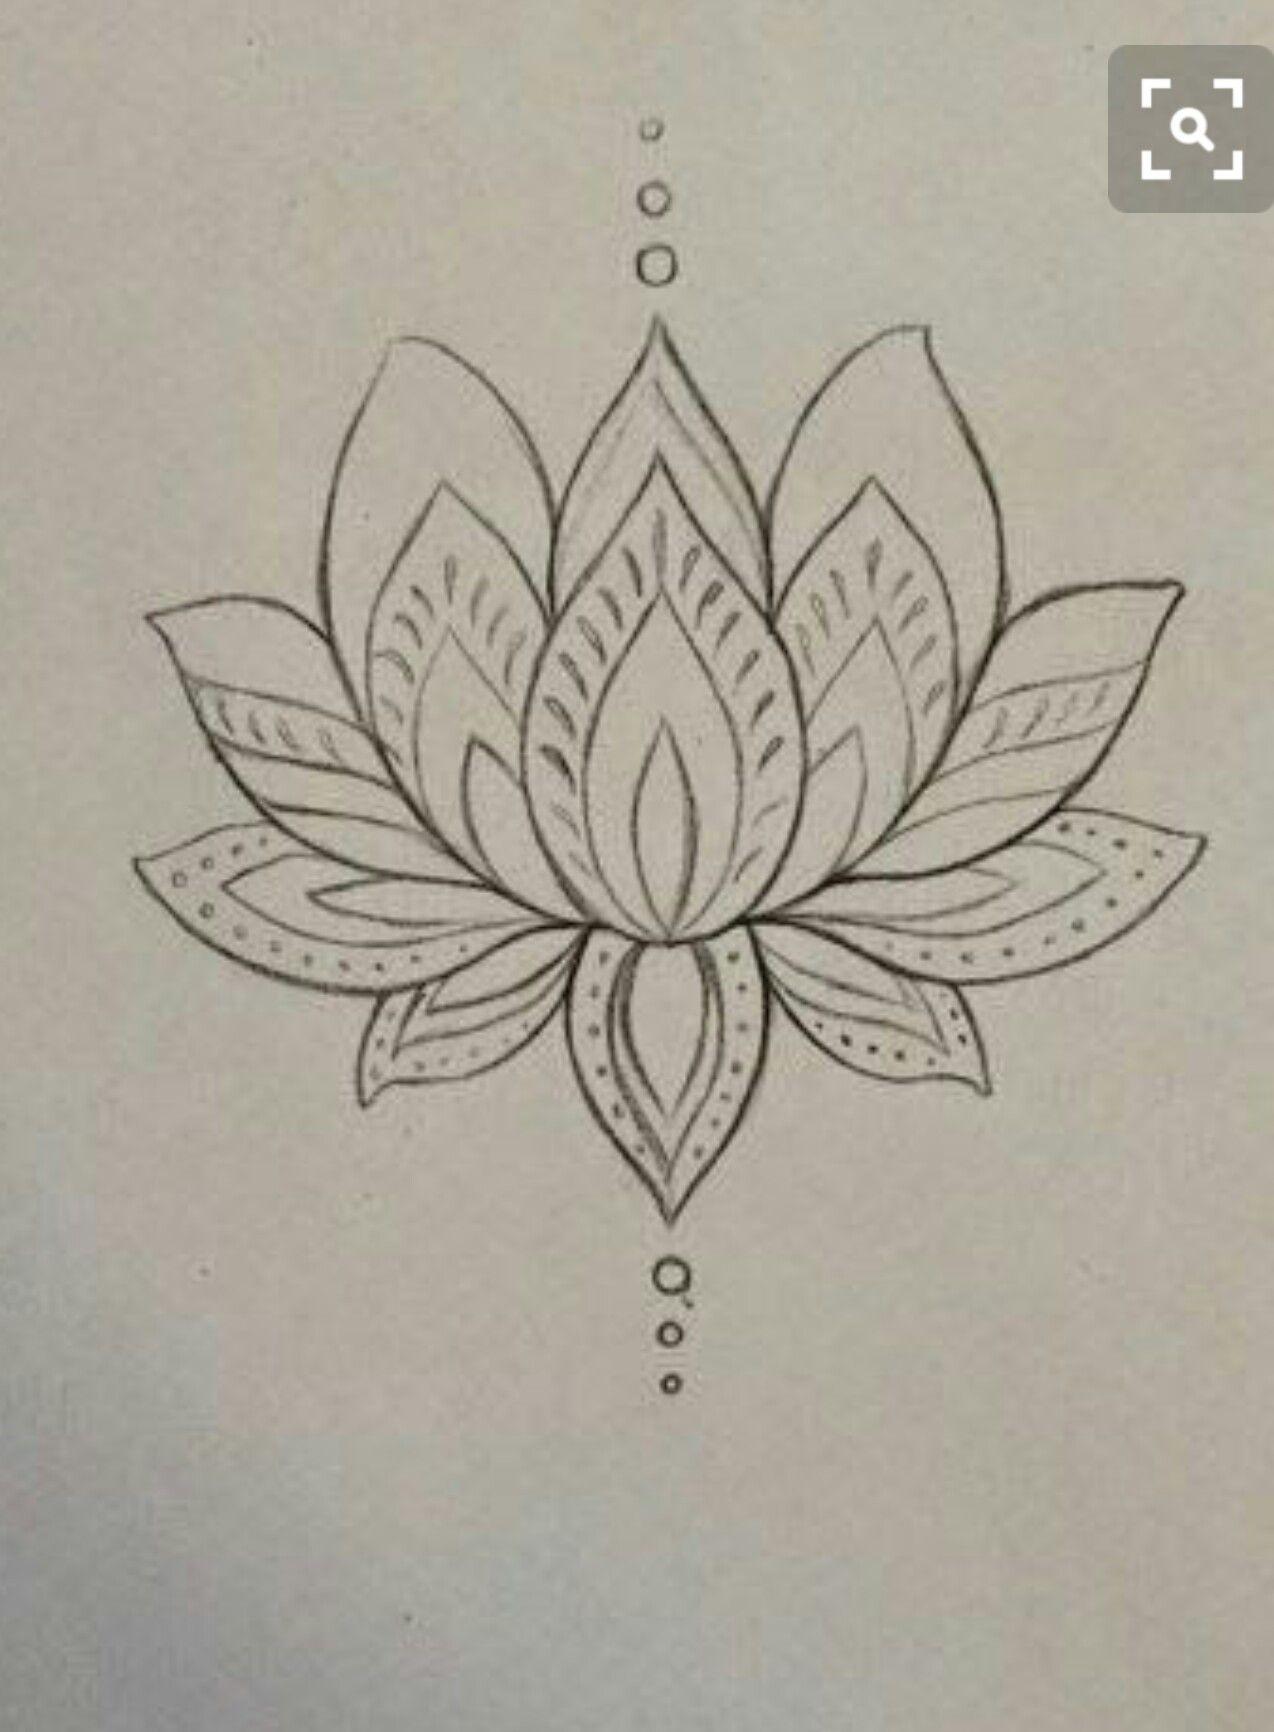 Pin By Christina Shaw On Tattoos Pinterest Tattoo